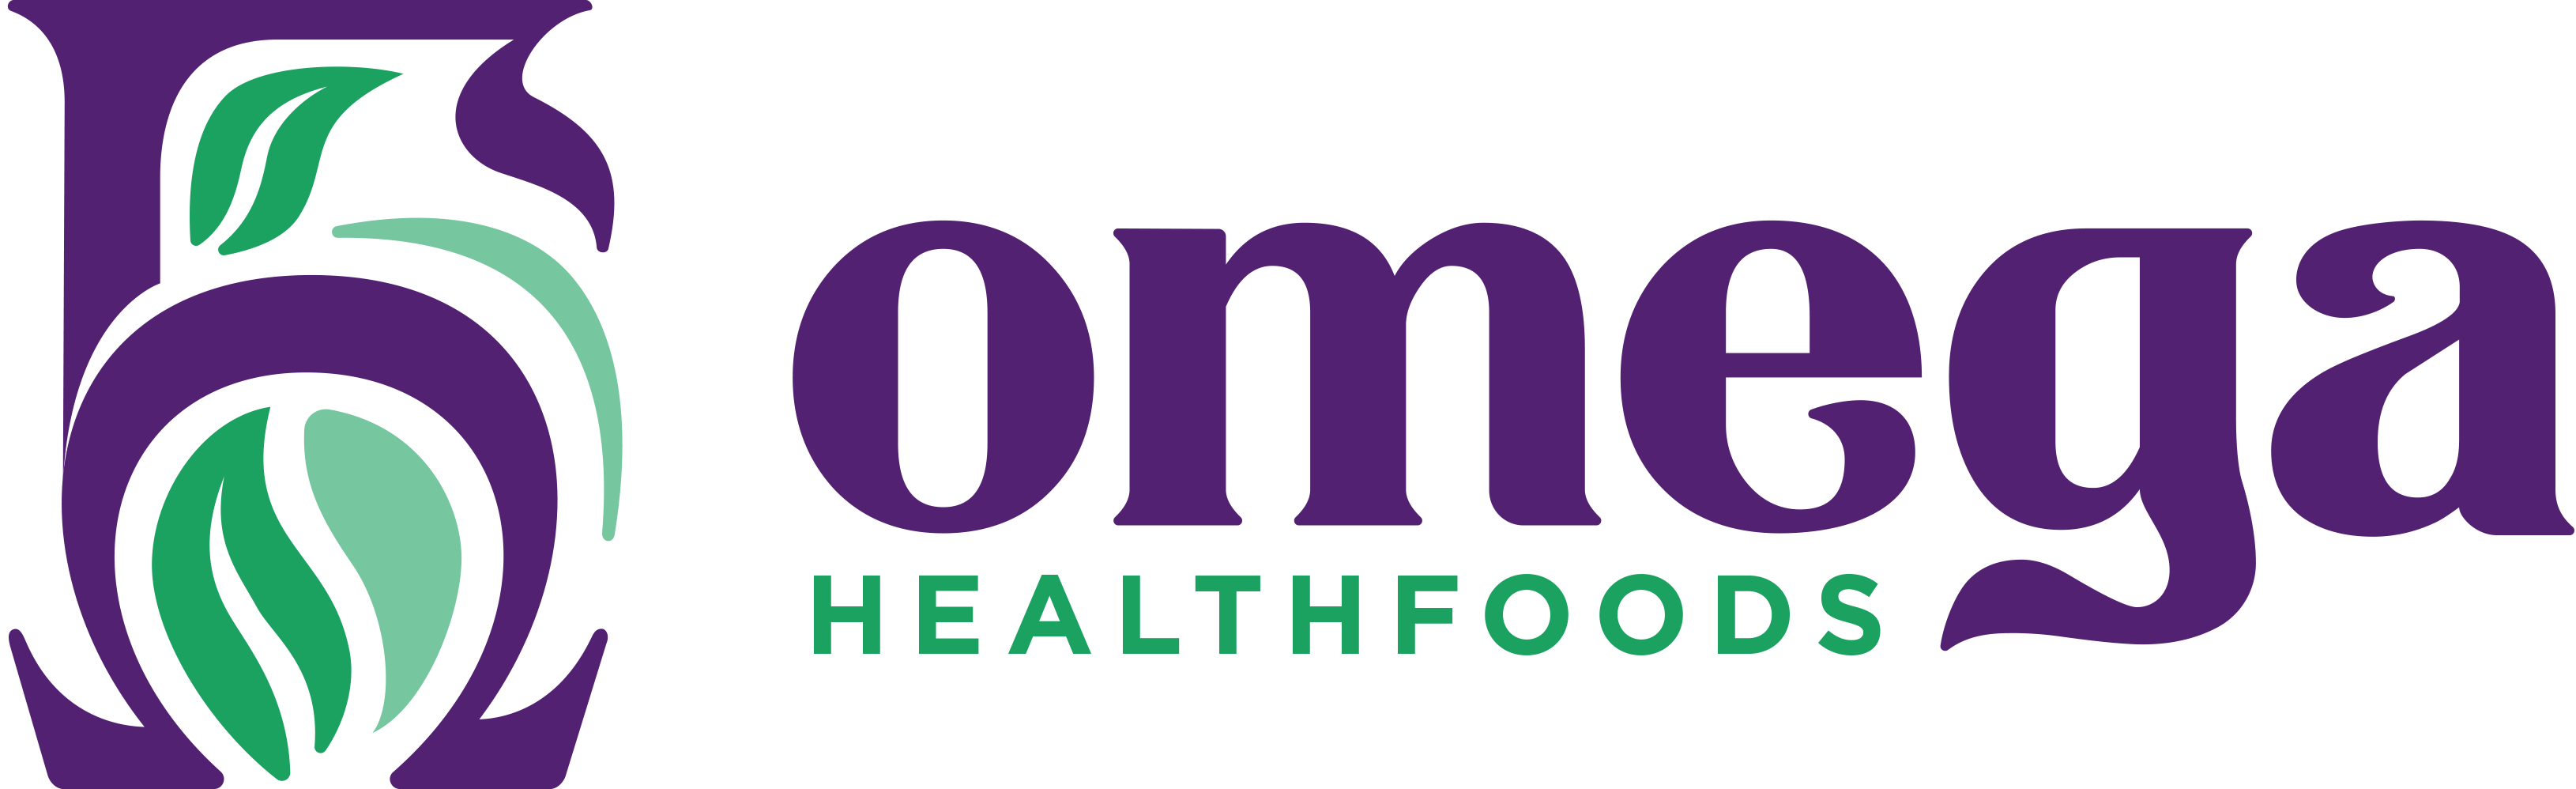 omega_healthfoods_logo (1)